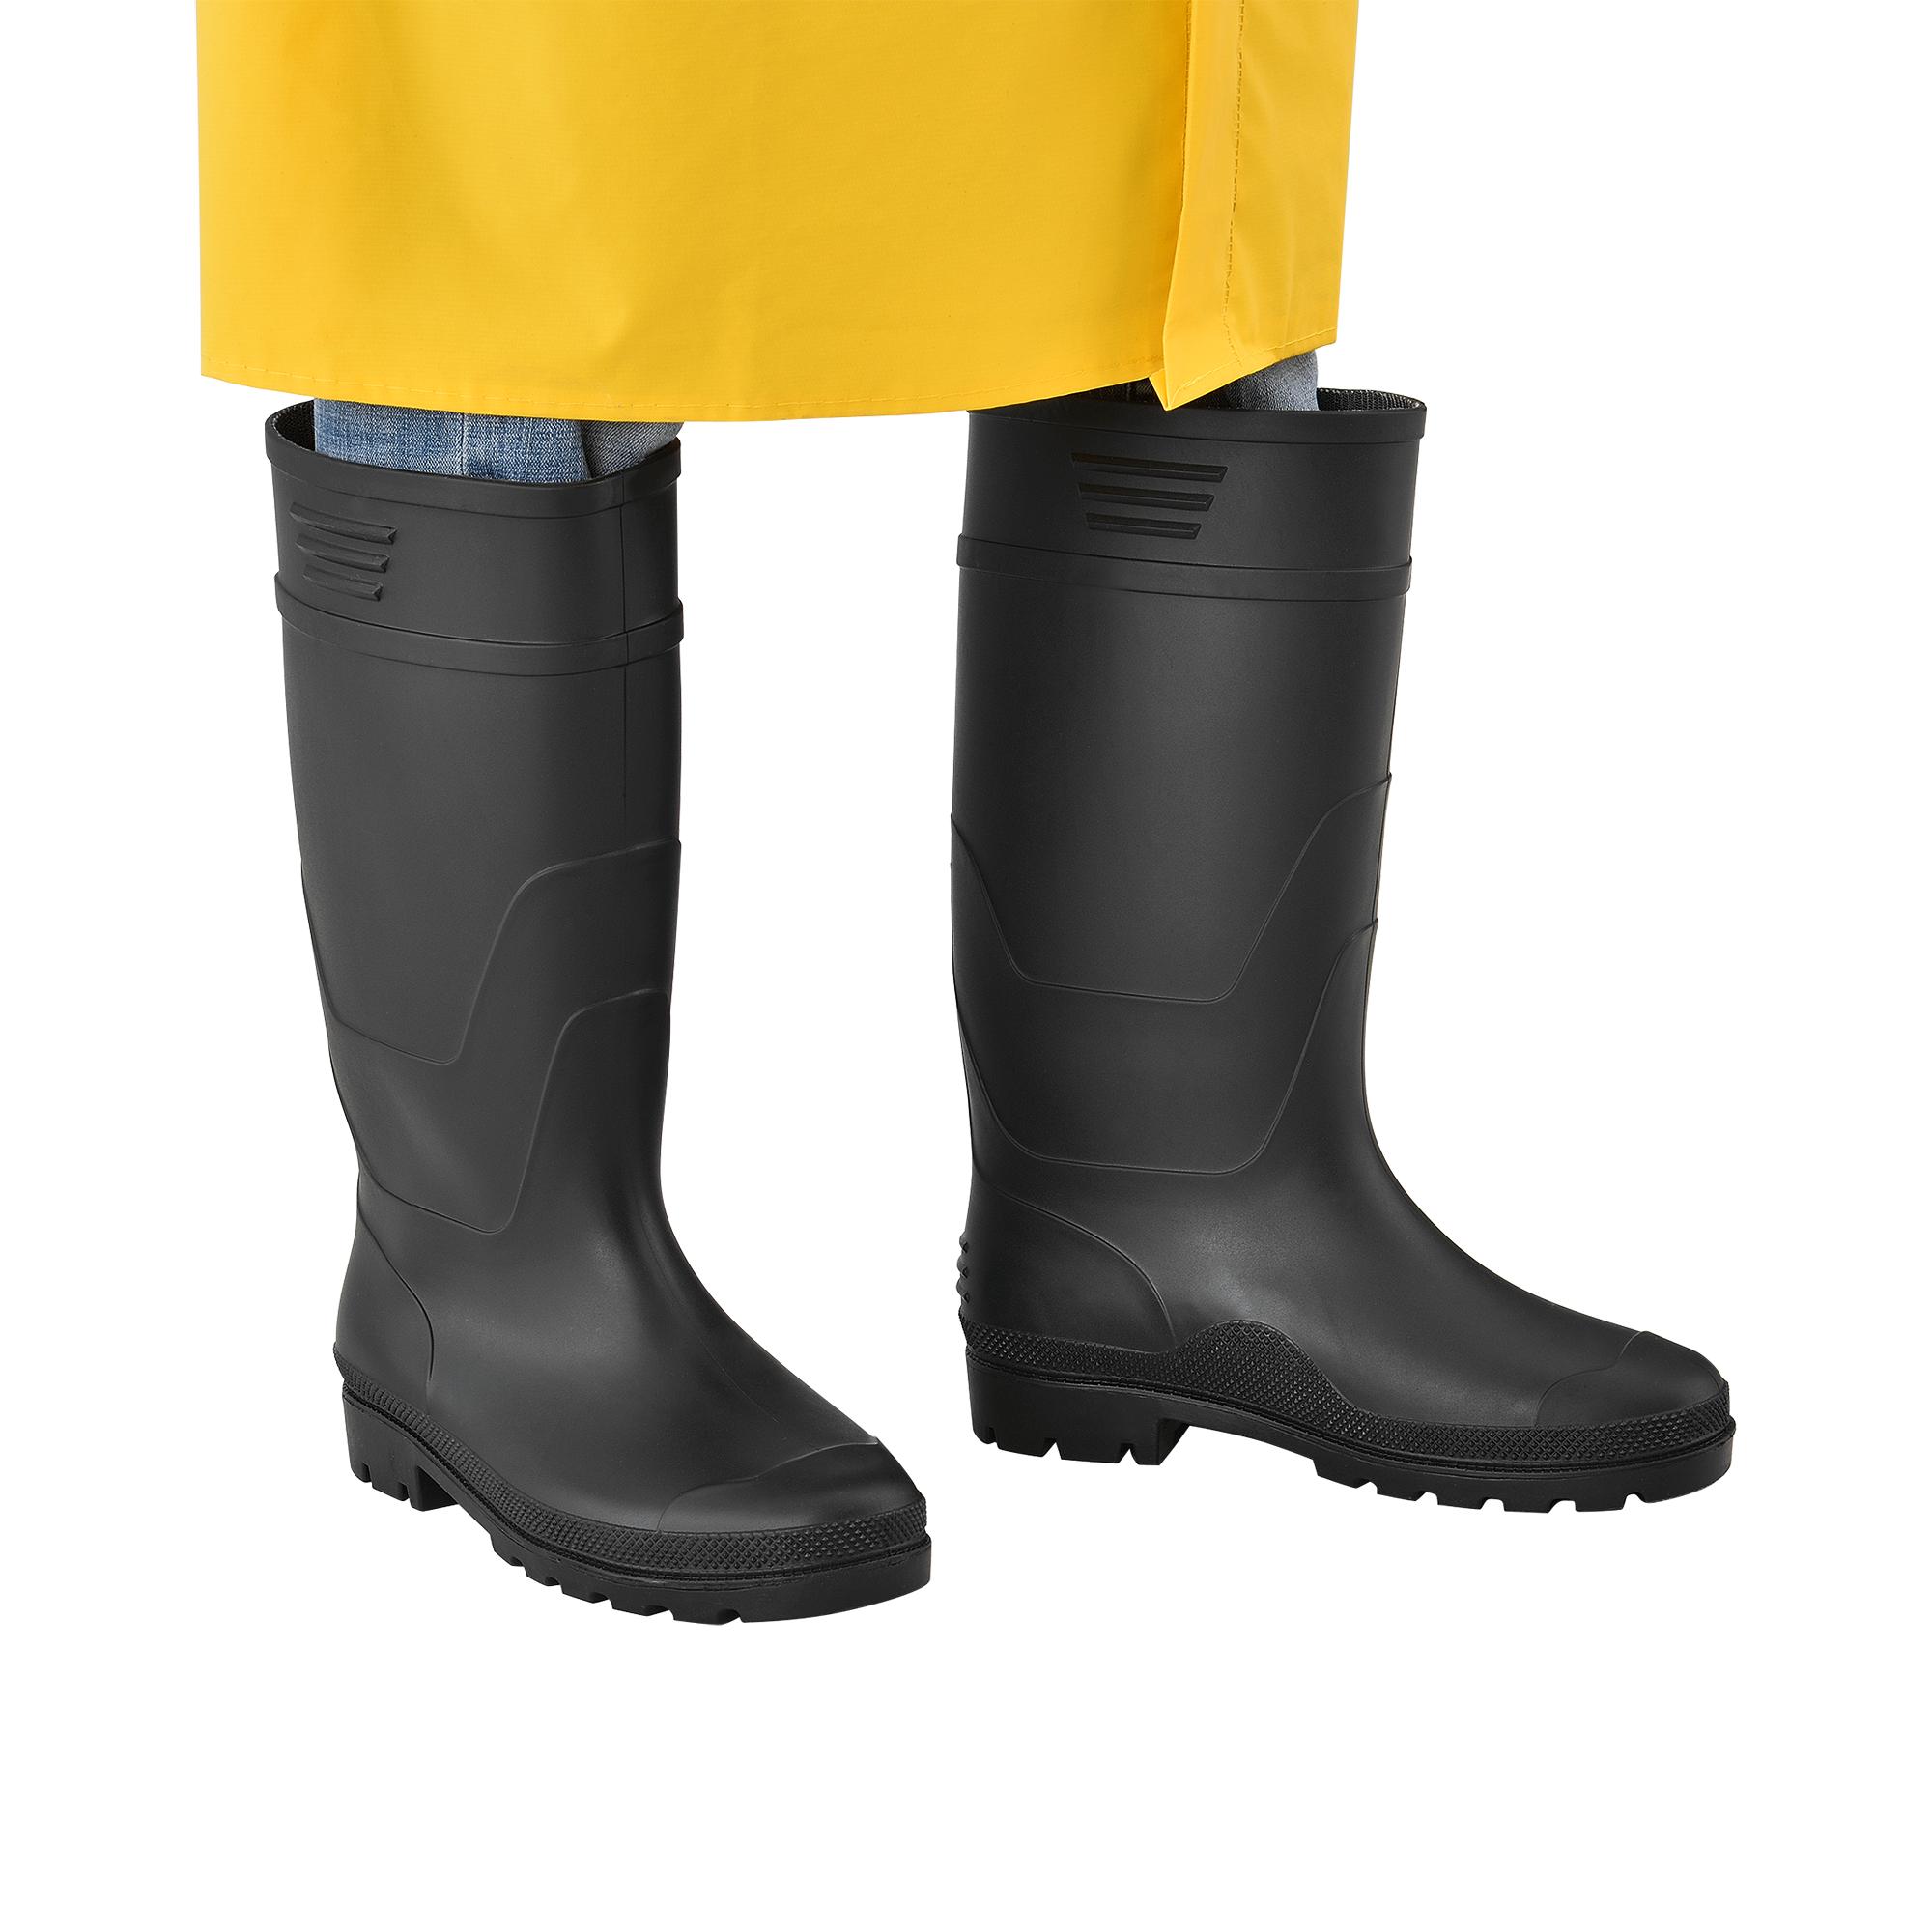 Gummistiefel Anglerstiefel Regenstiefel Stiefel PVC Schwarz Gr 46